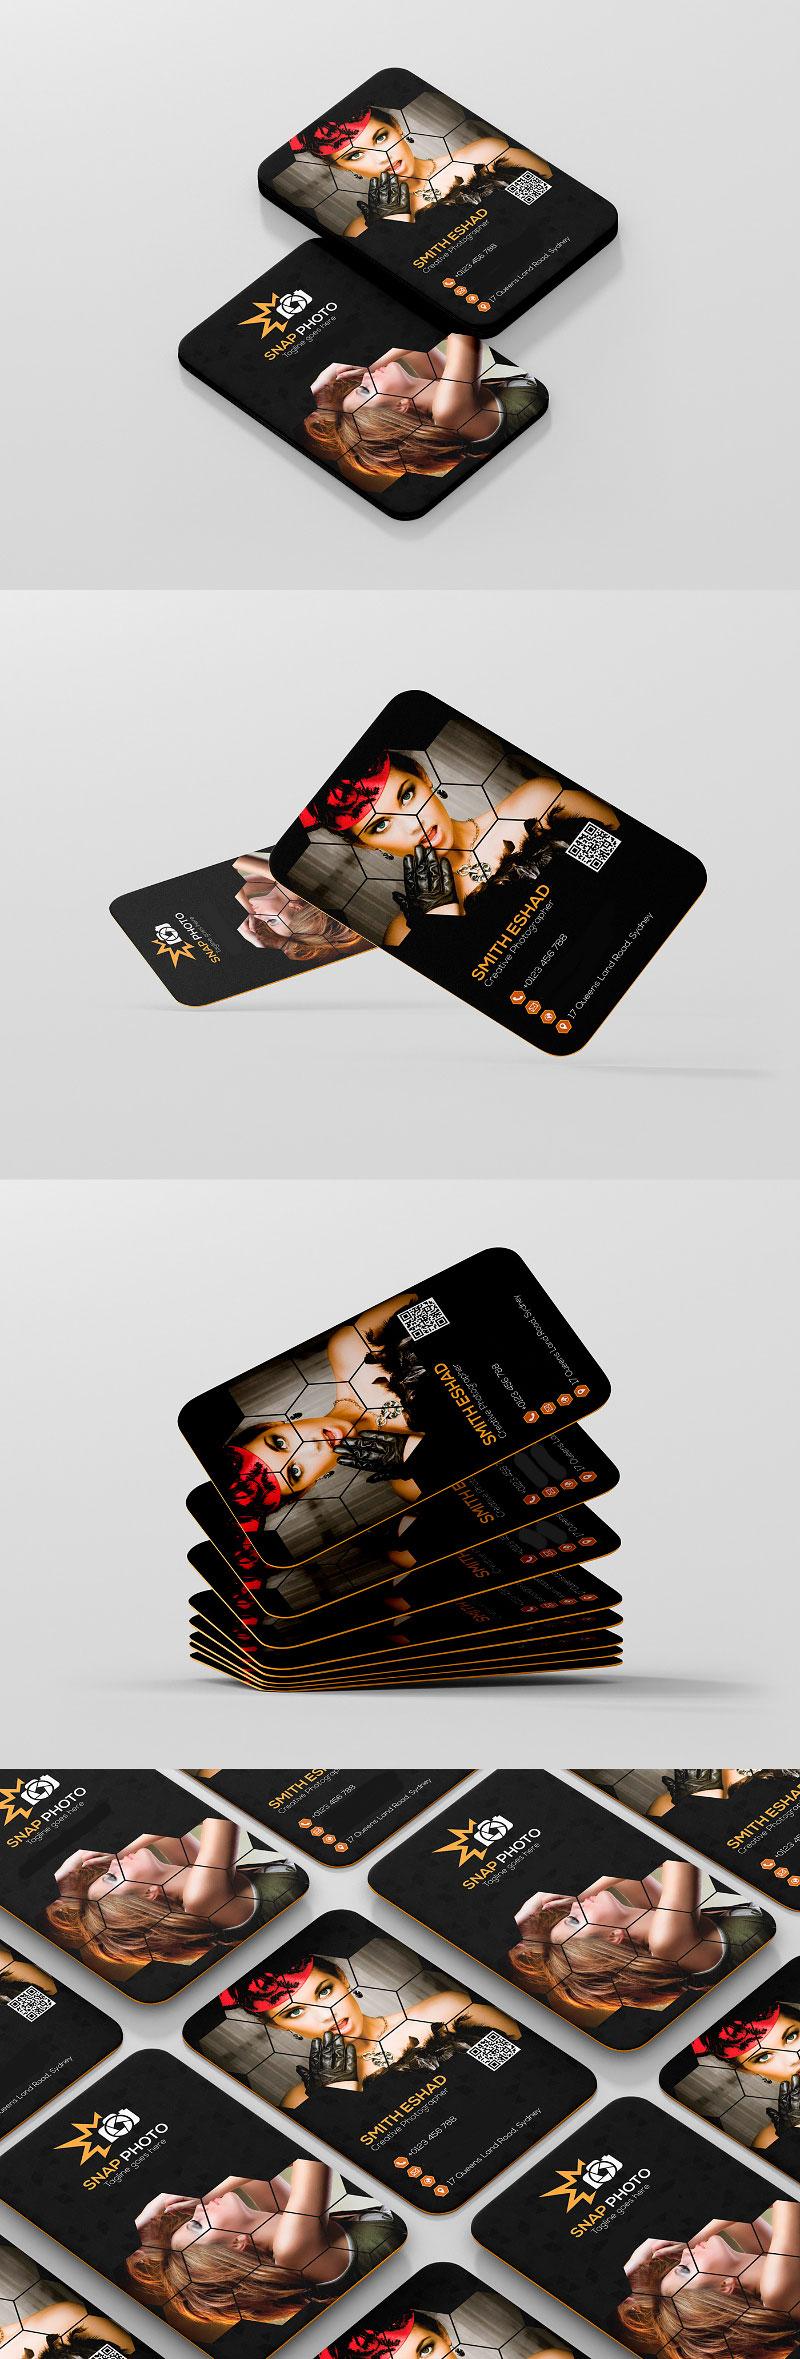 p700 - لایه باز کارت ویزیت عکاسی و زیبایی آتلیه عروسی